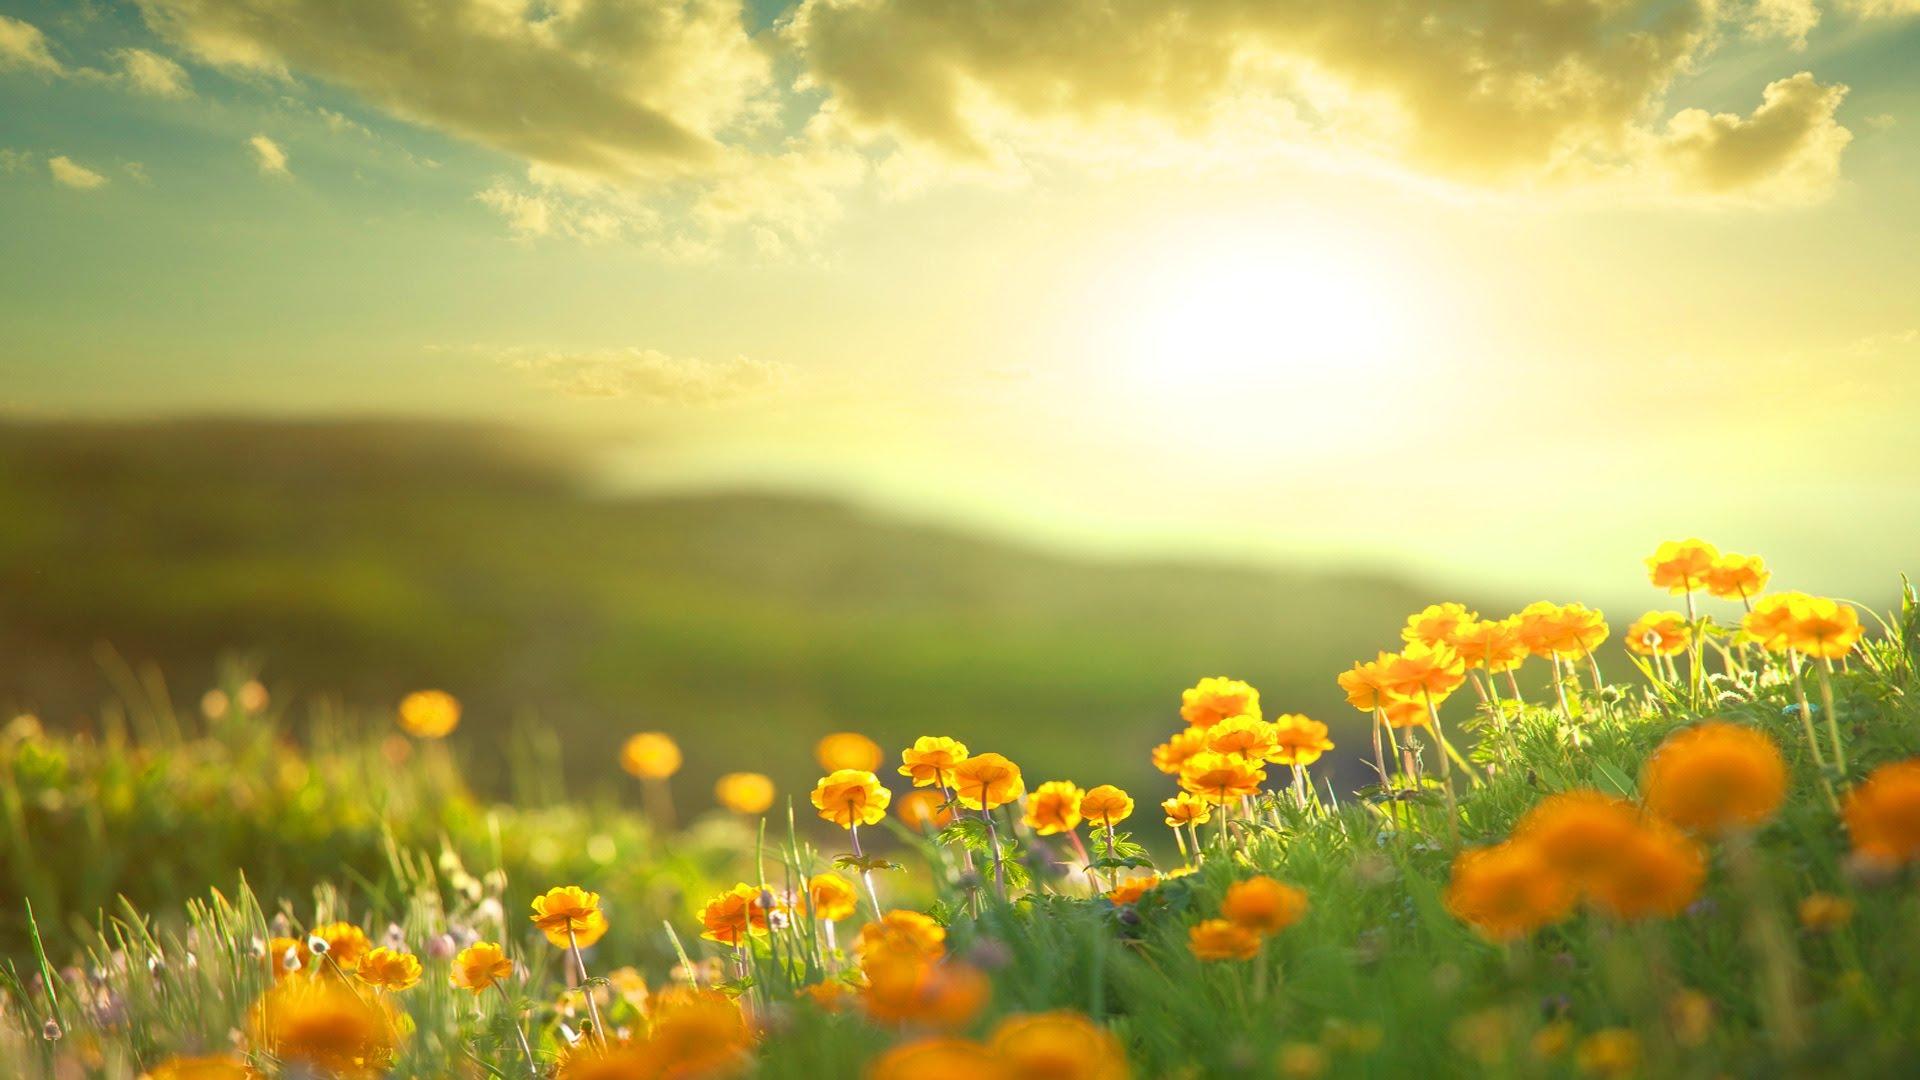 Morning Sunshine On Flowers HD Wallpaper